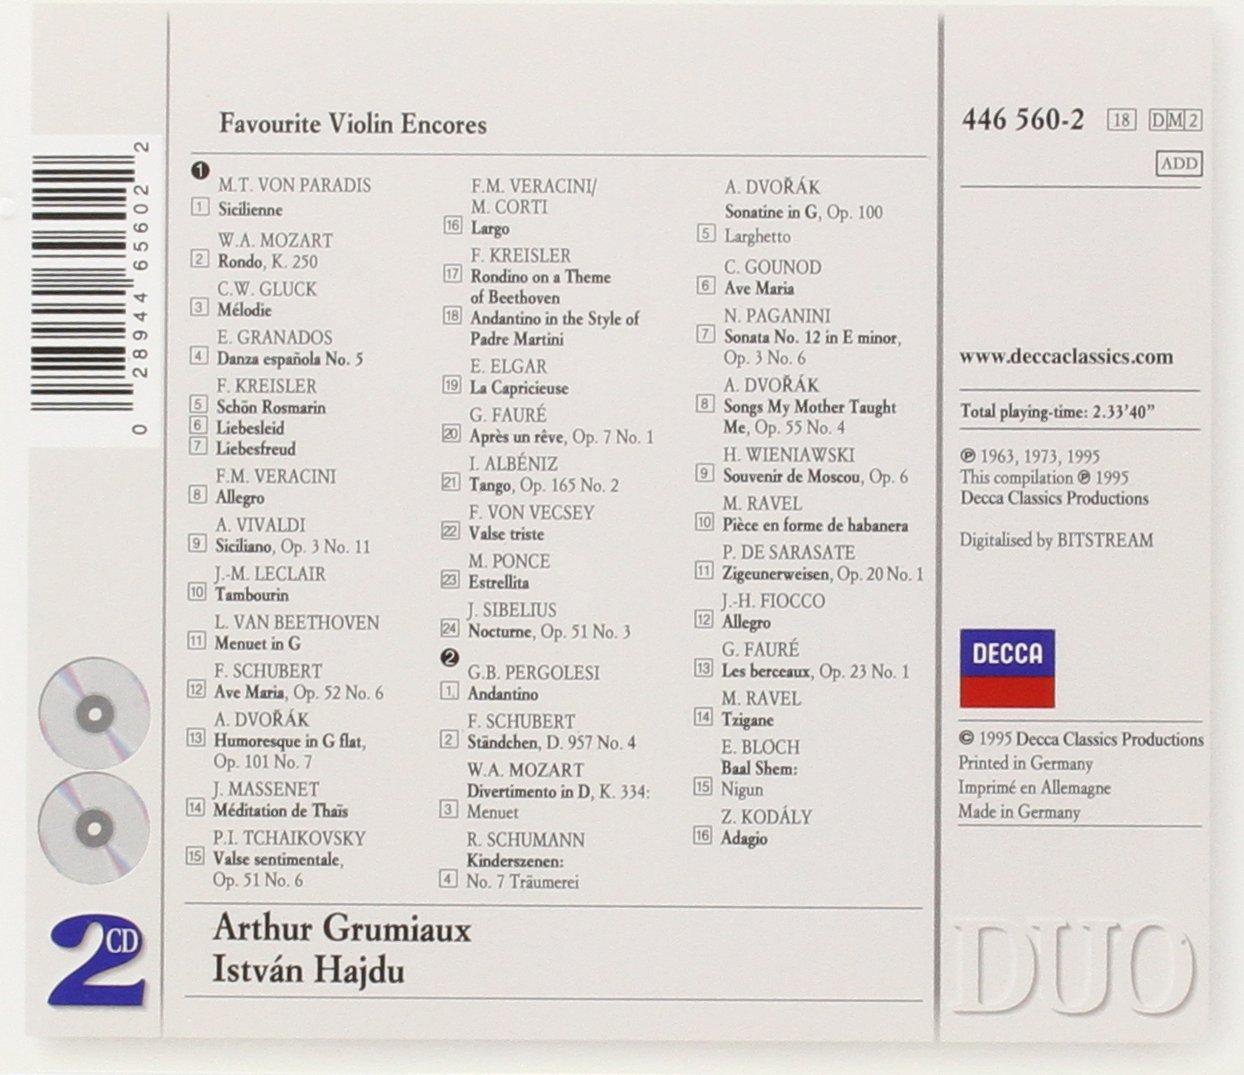 Favorite Violin Encores by Philips